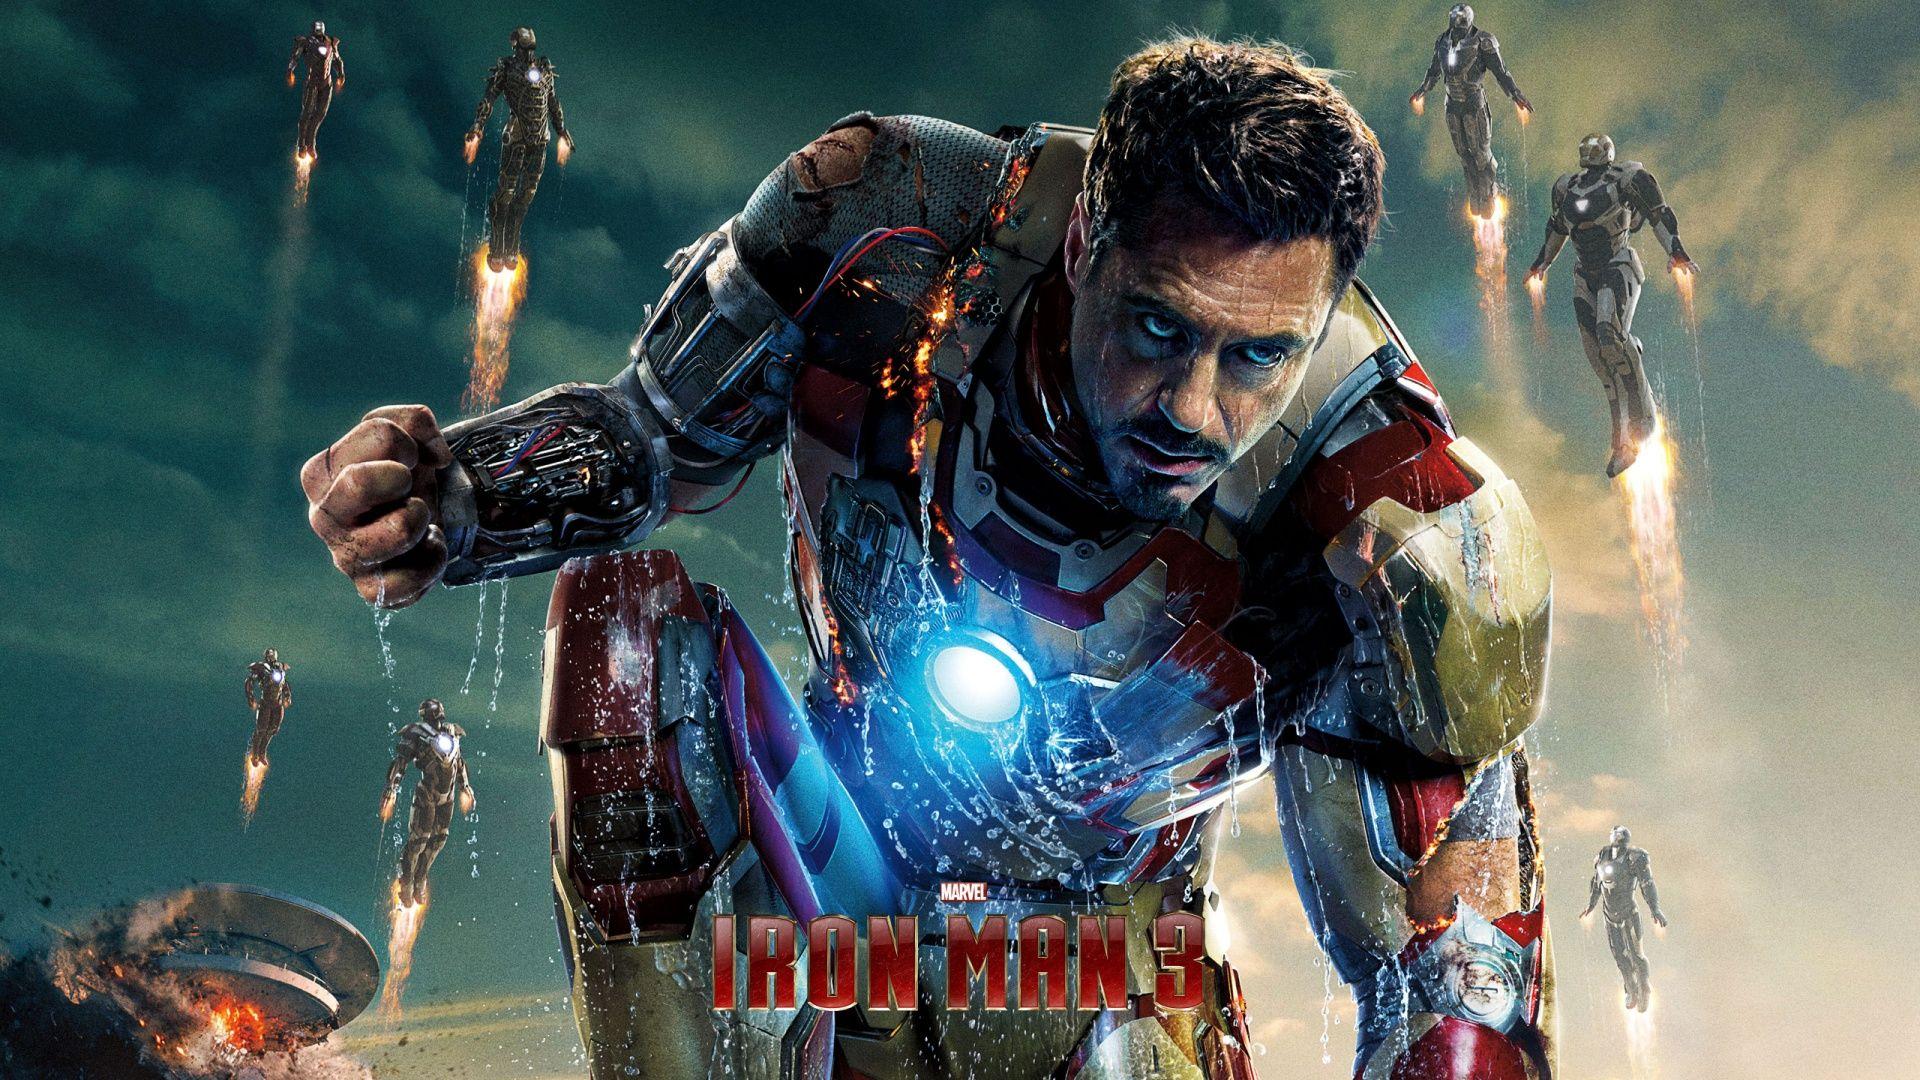 Iron Man 3 Movie Poster 1080p HD Wallpaper Movies